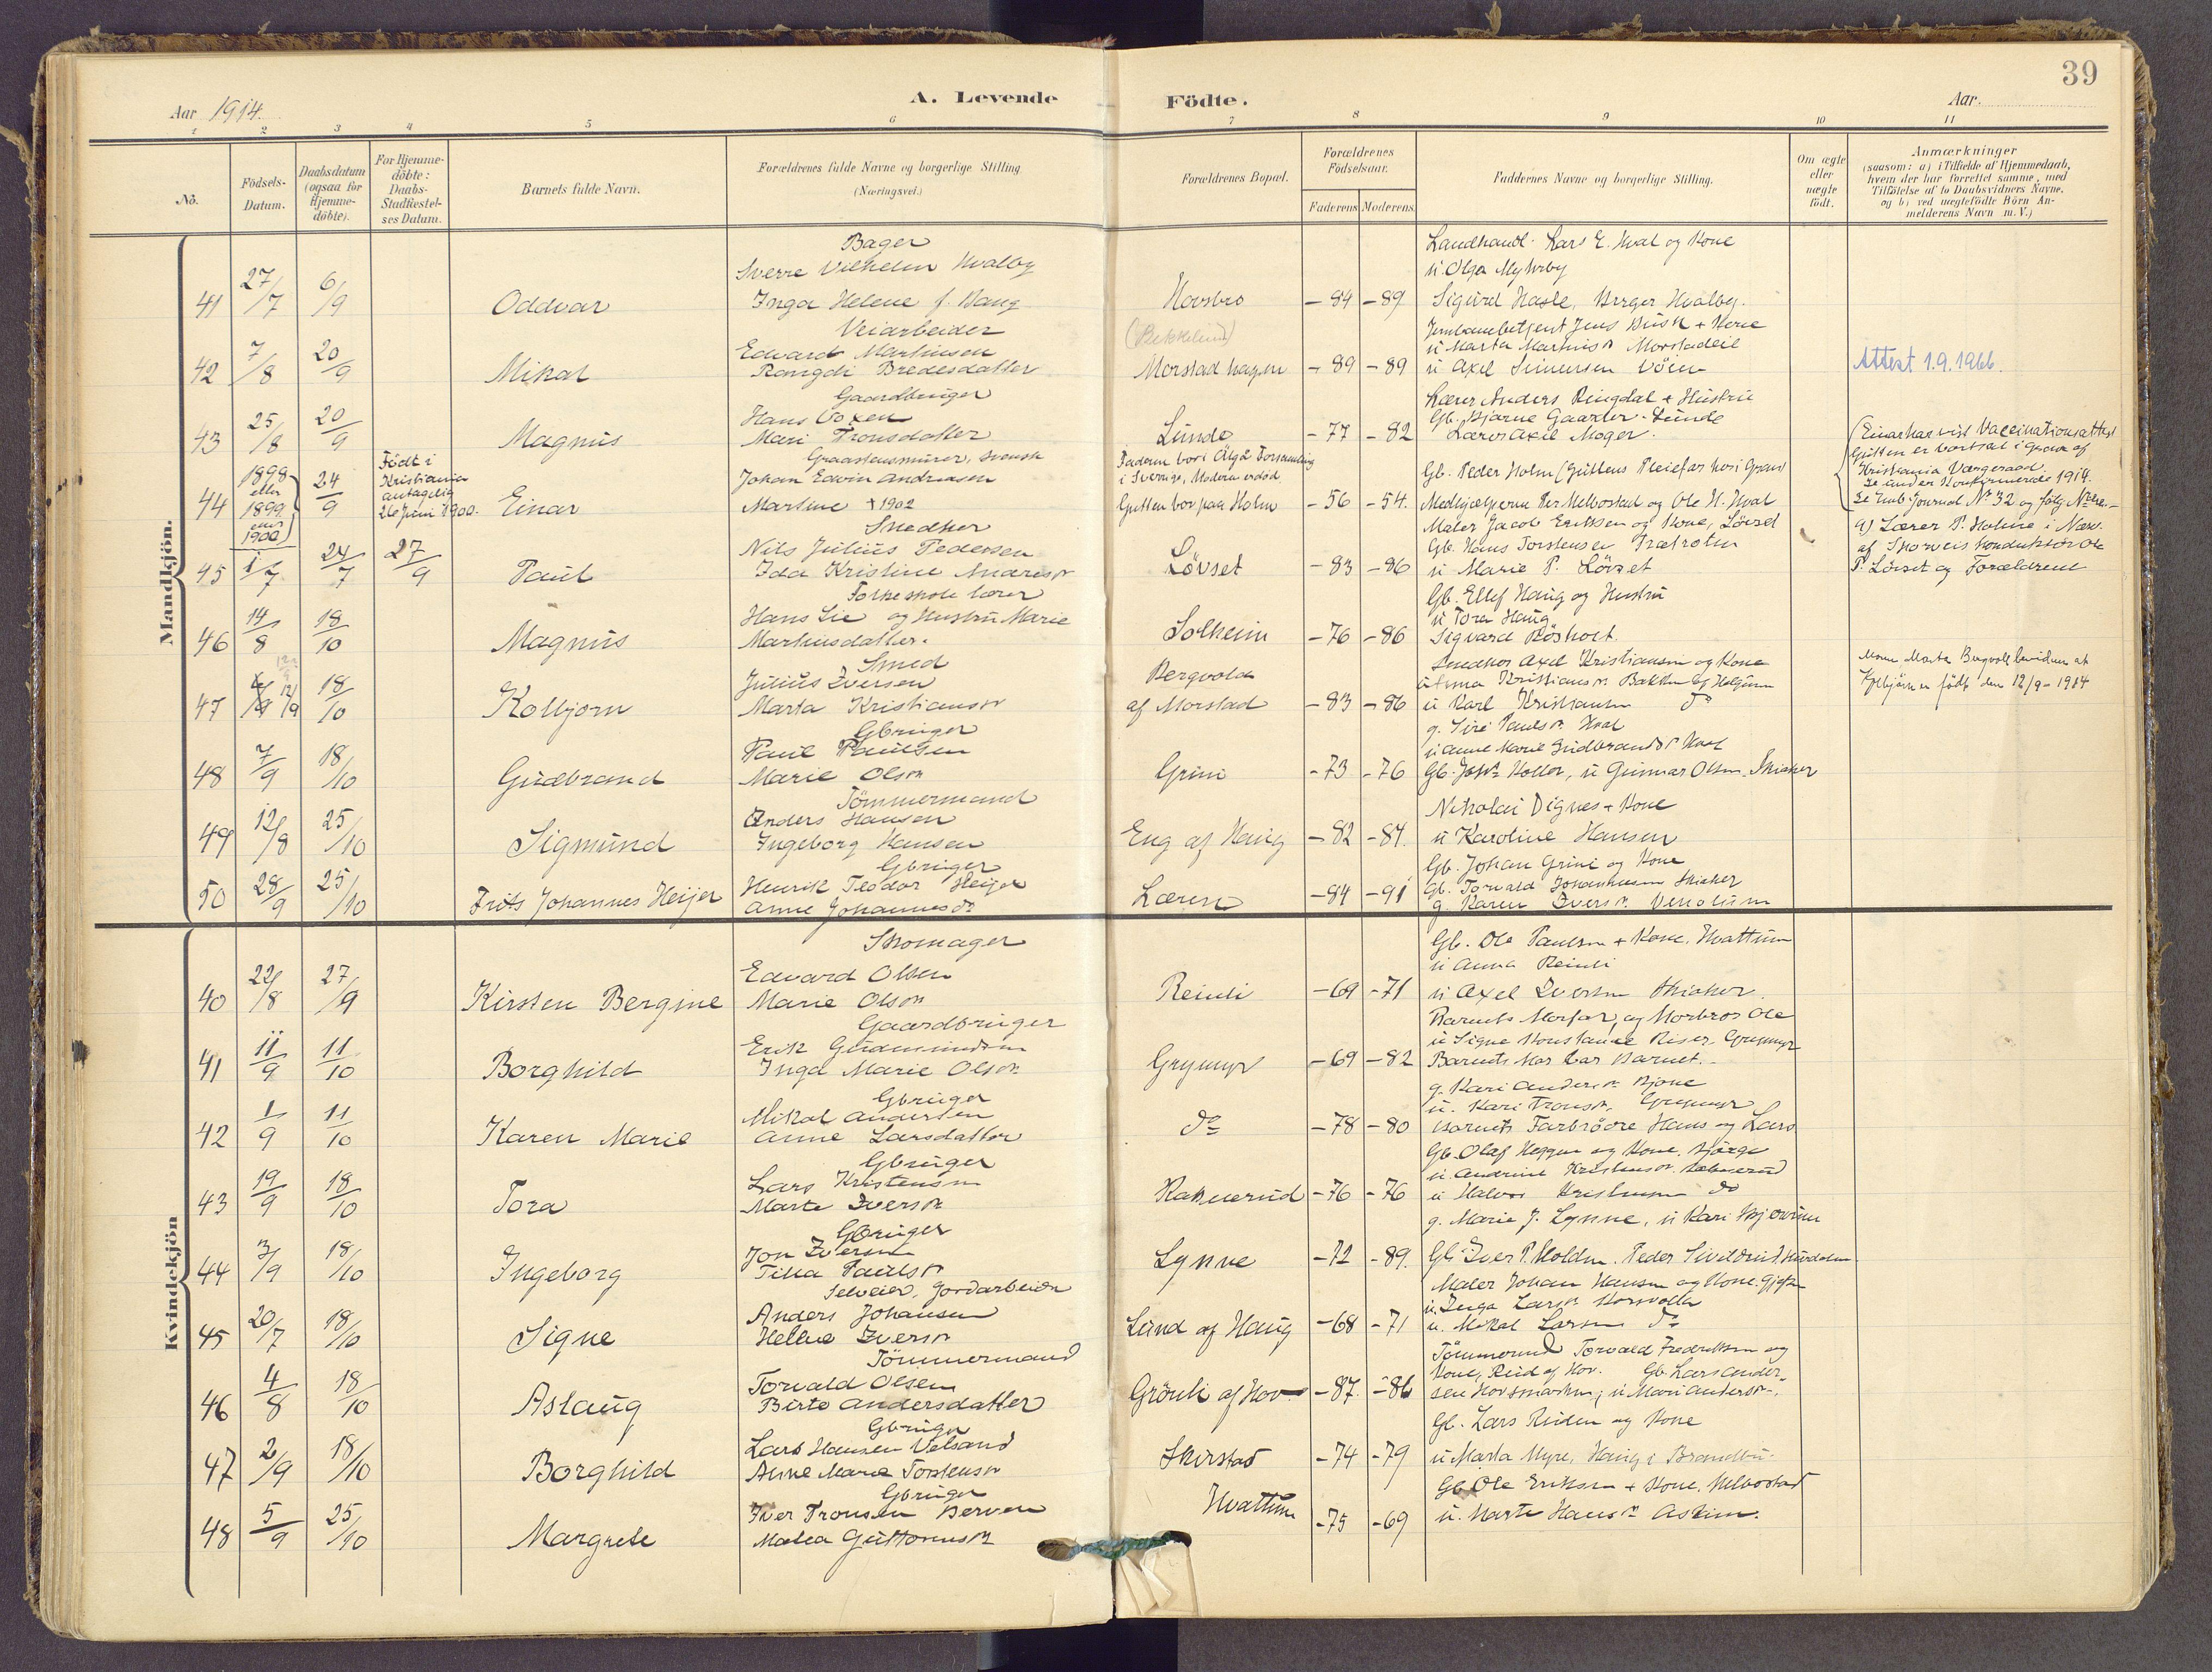 SAH, Gran prestekontor, Ministerialbok nr. 21, 1908-1932, s. 39